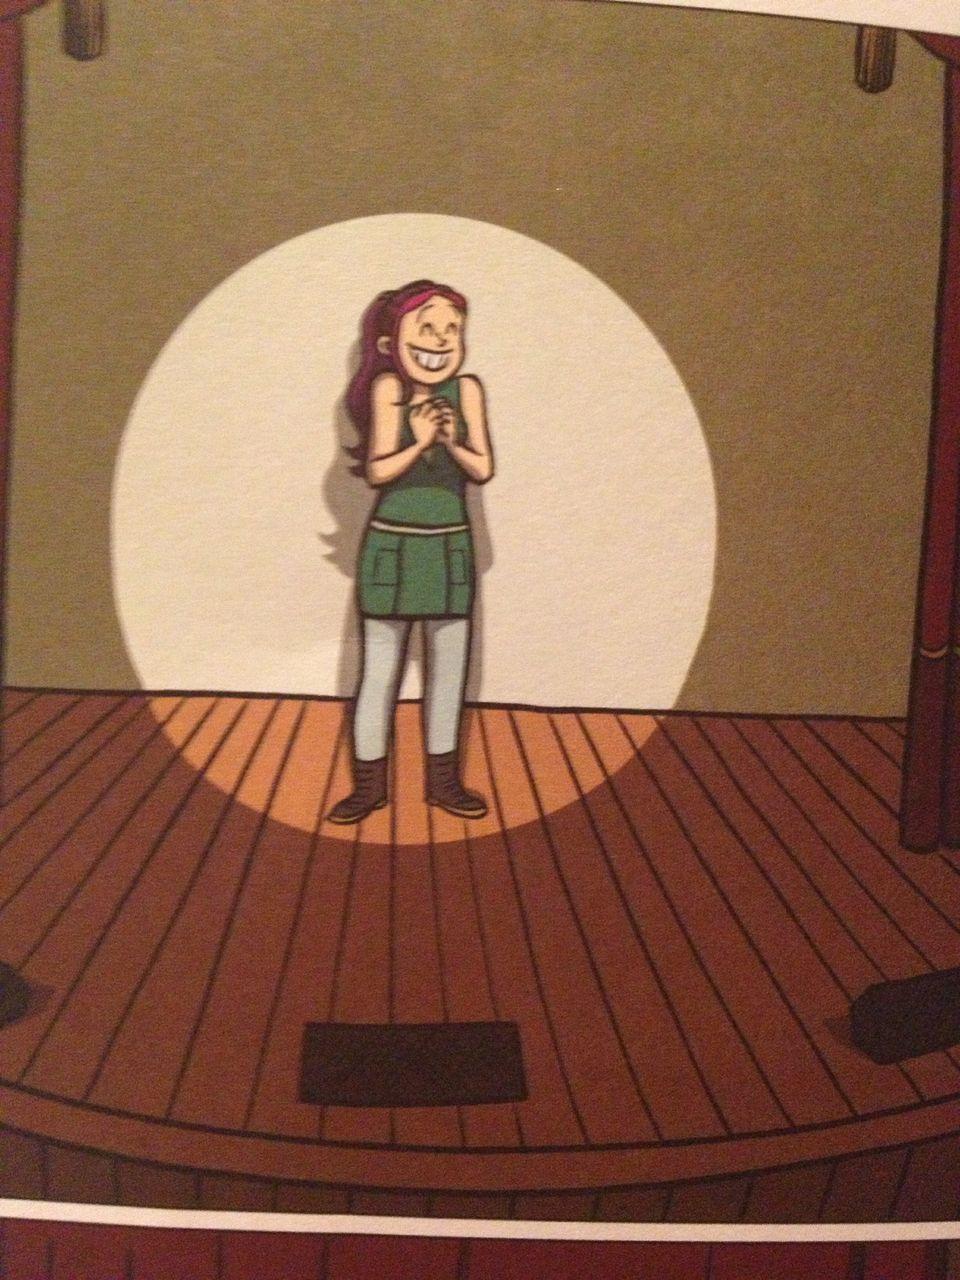 ALPHA reader: 'Drama' by Raina Telgemeier